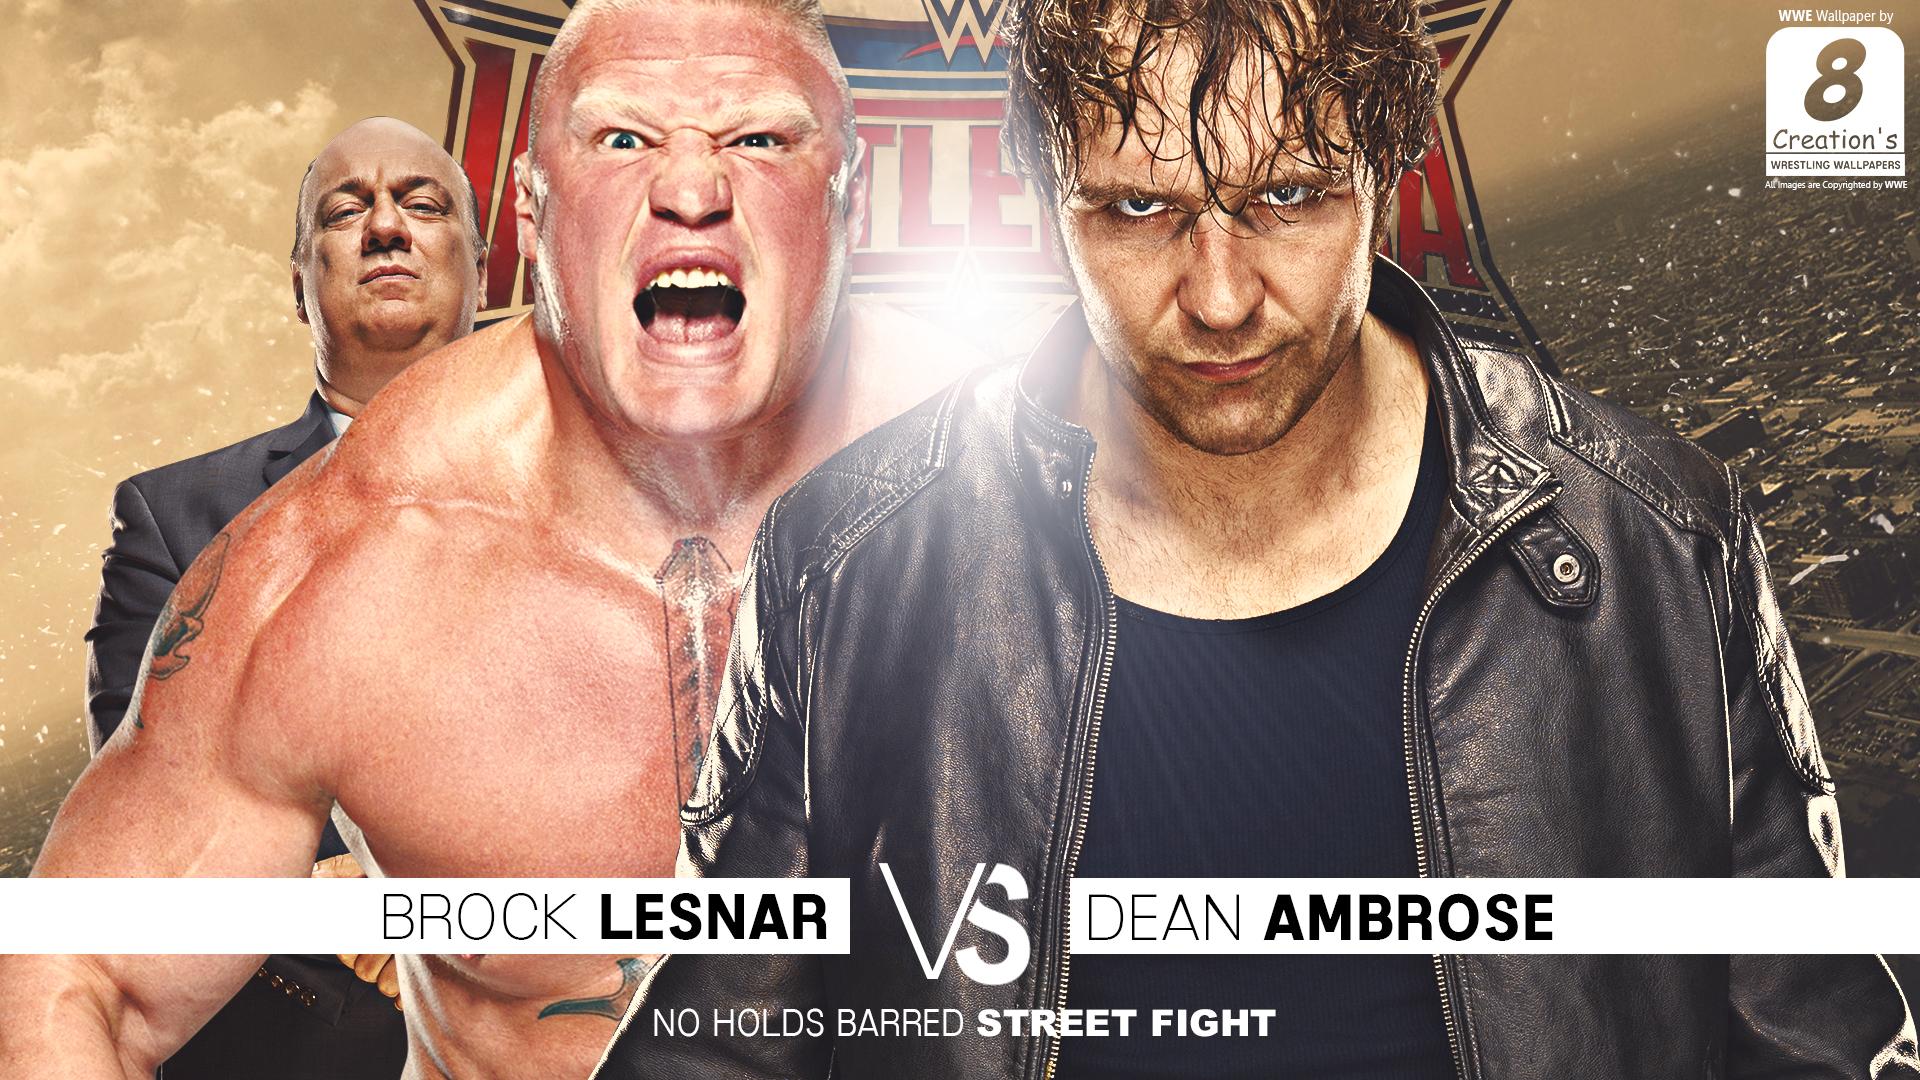 Dean Ambrose Vs Brock Lesnar Wallpaper By Arunraj1791 On Deviantart